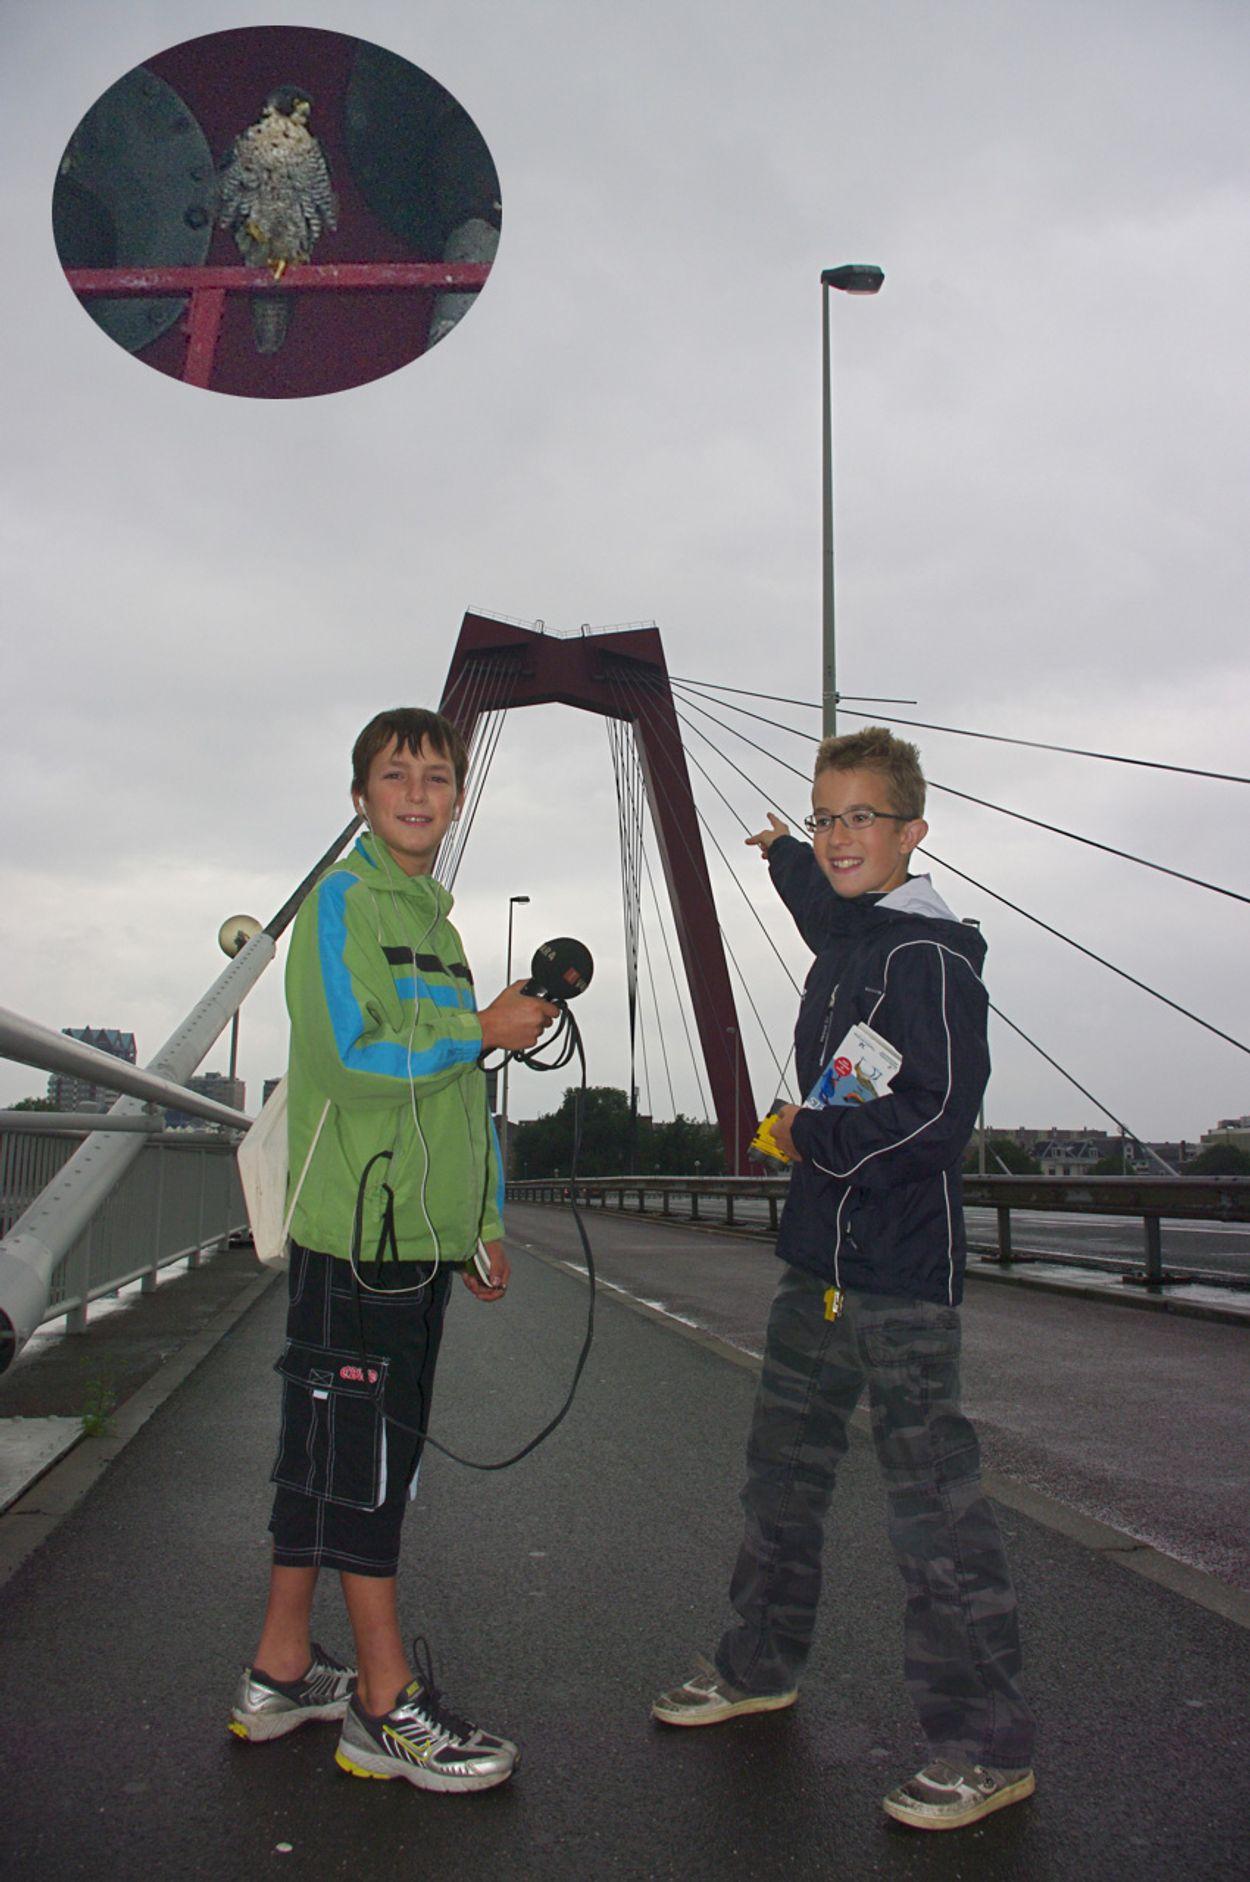 Afbeelding van Rotterdams jongste stadsbioloog_19_08_2010